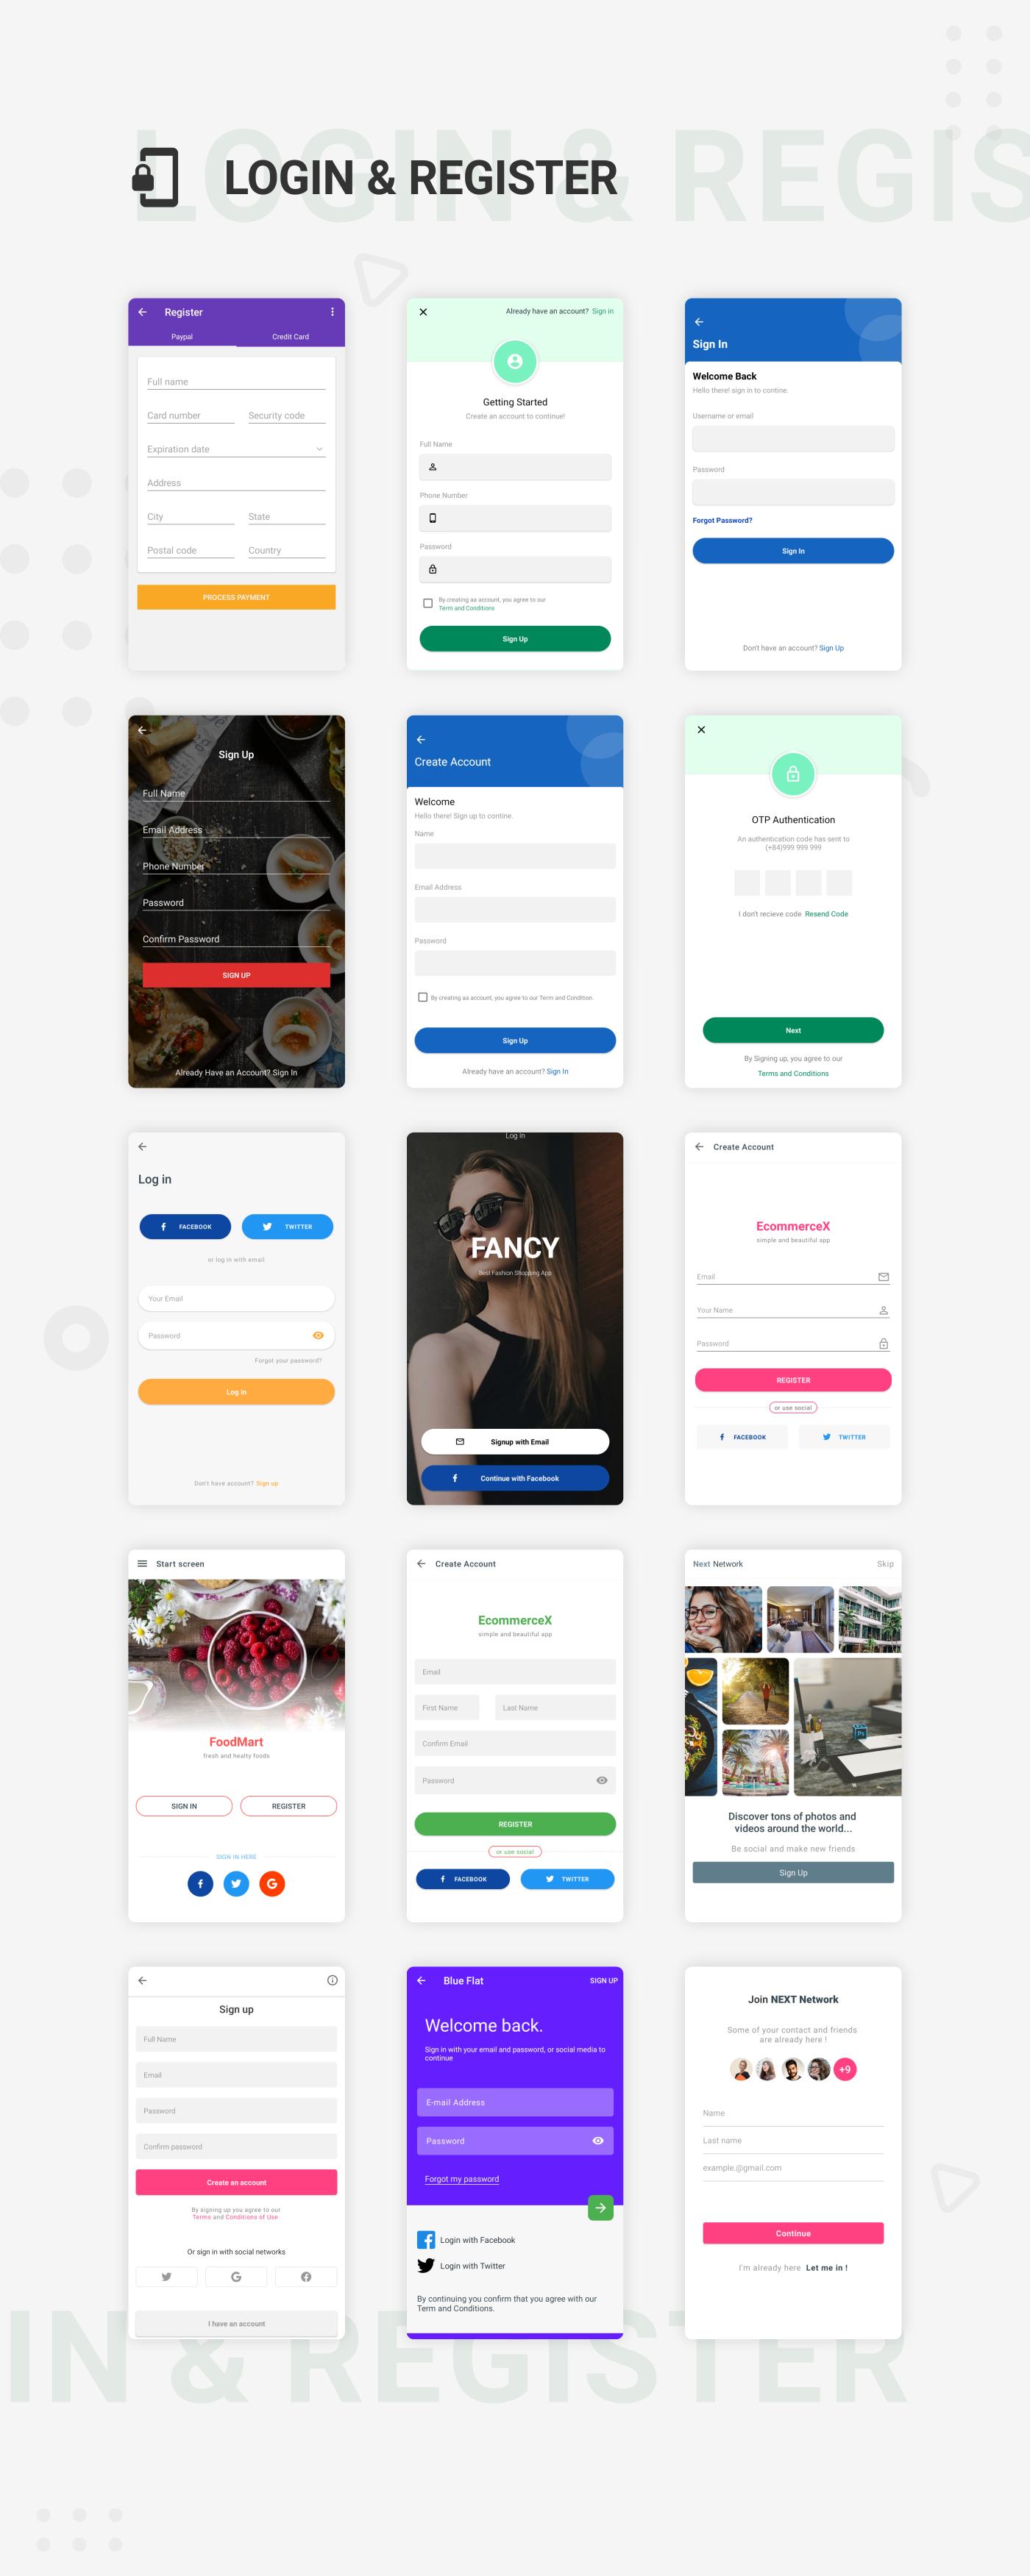 EcommerceX - Premium Ecommerce App UI Kit Template 1.0 - 6